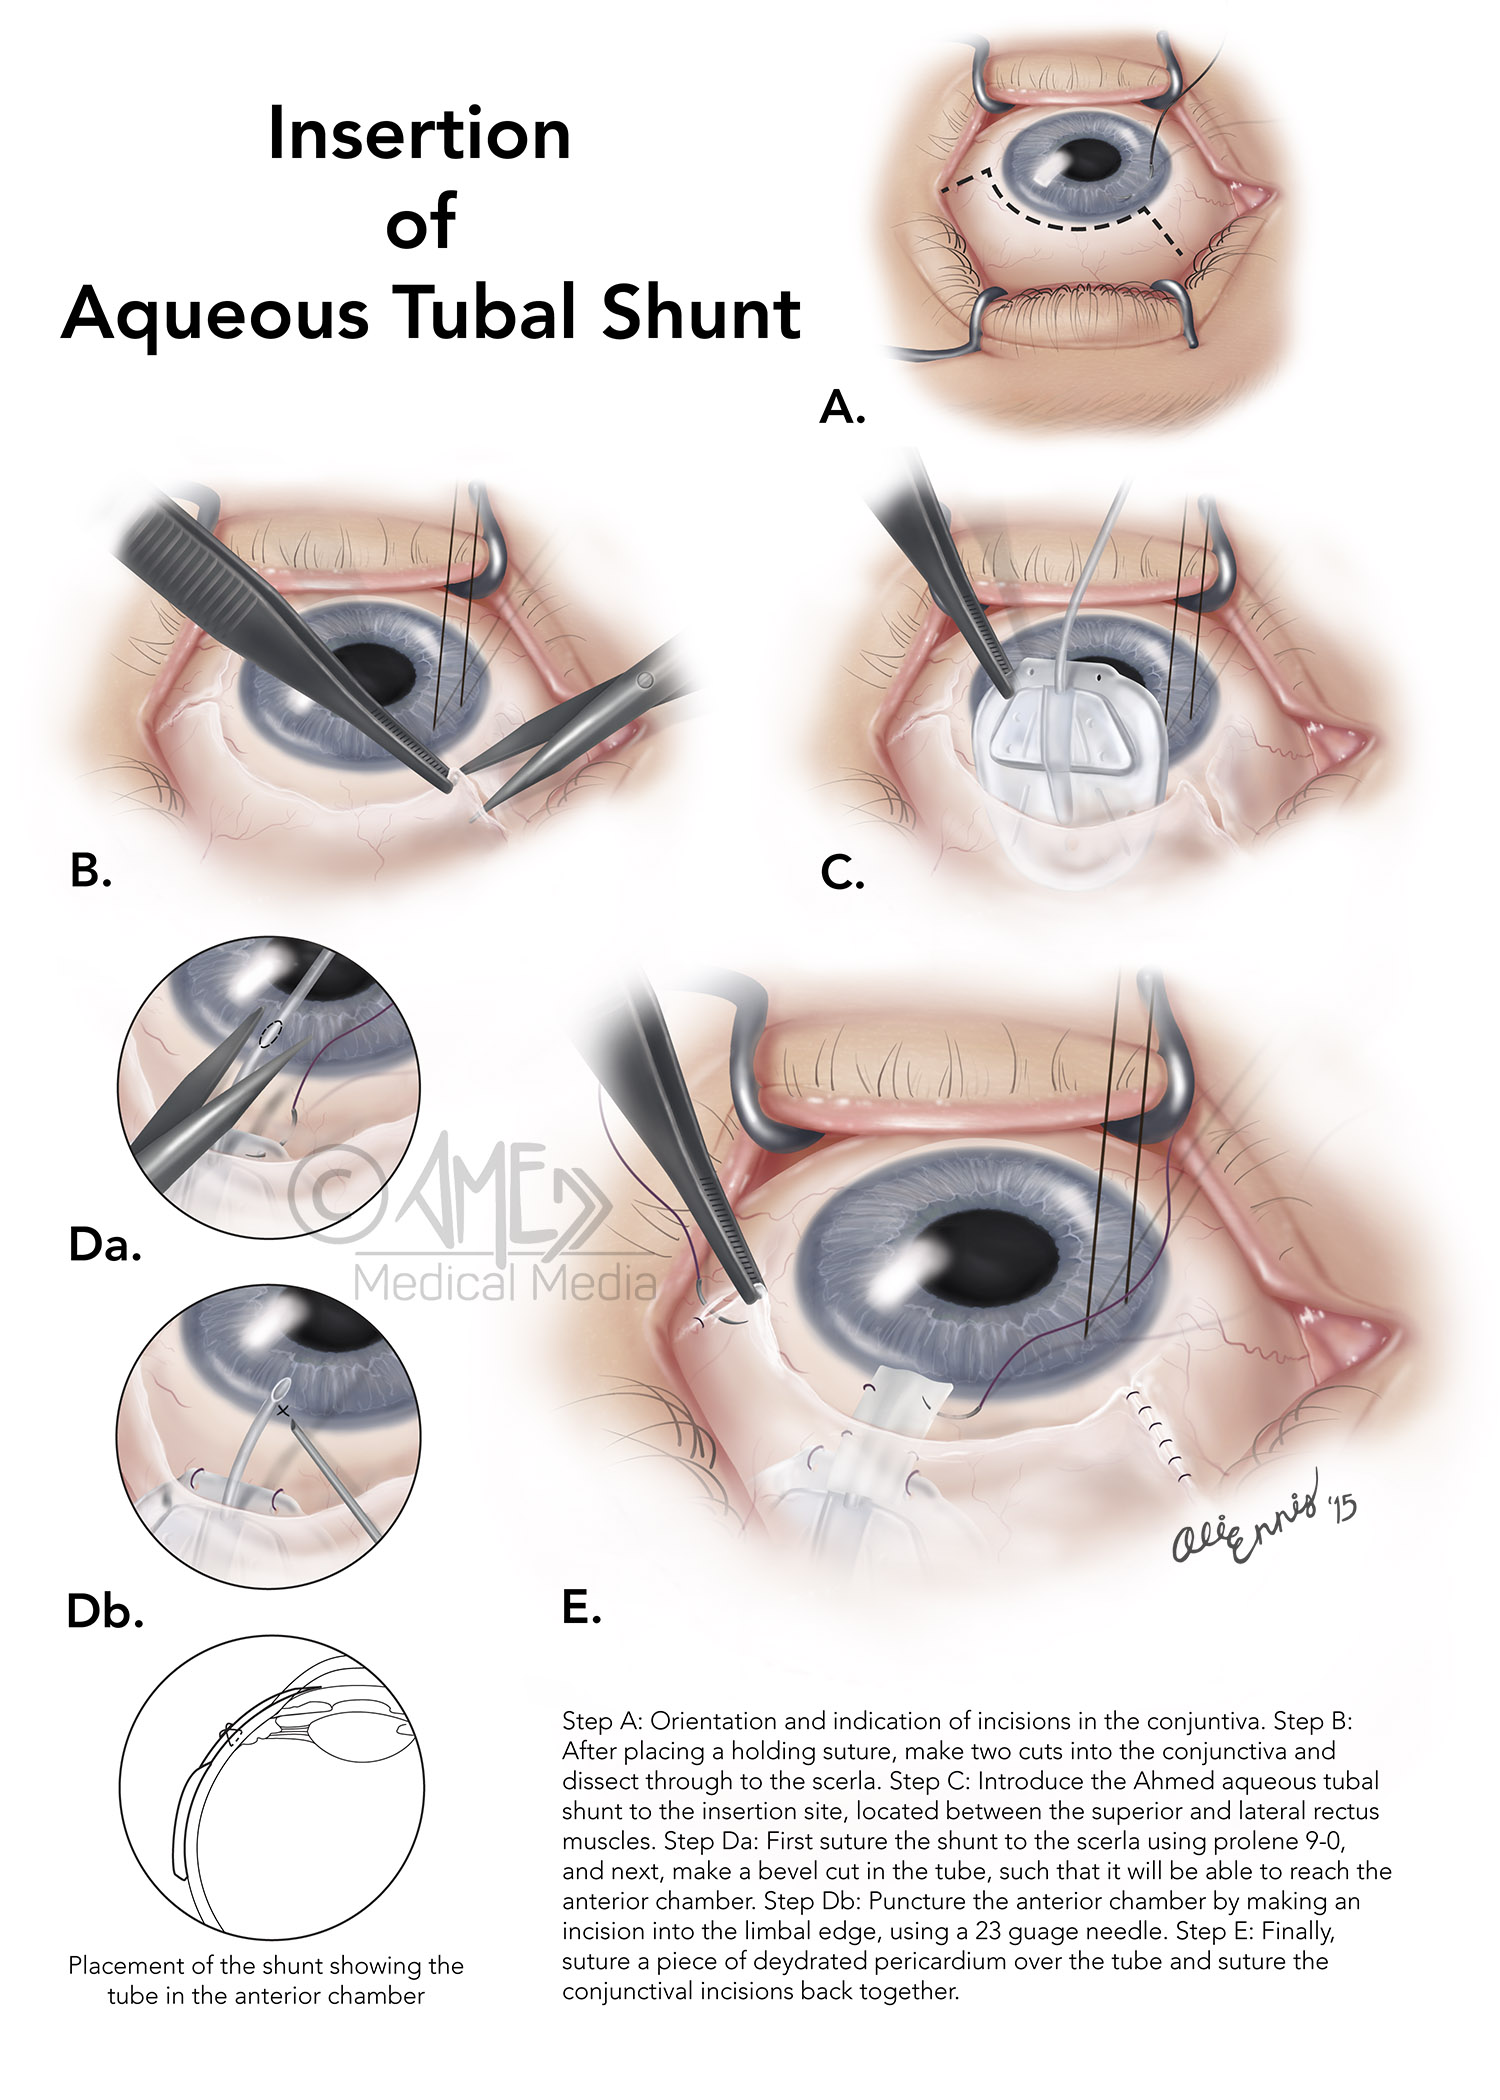 Insertion of Aqueous Tubal Shunt